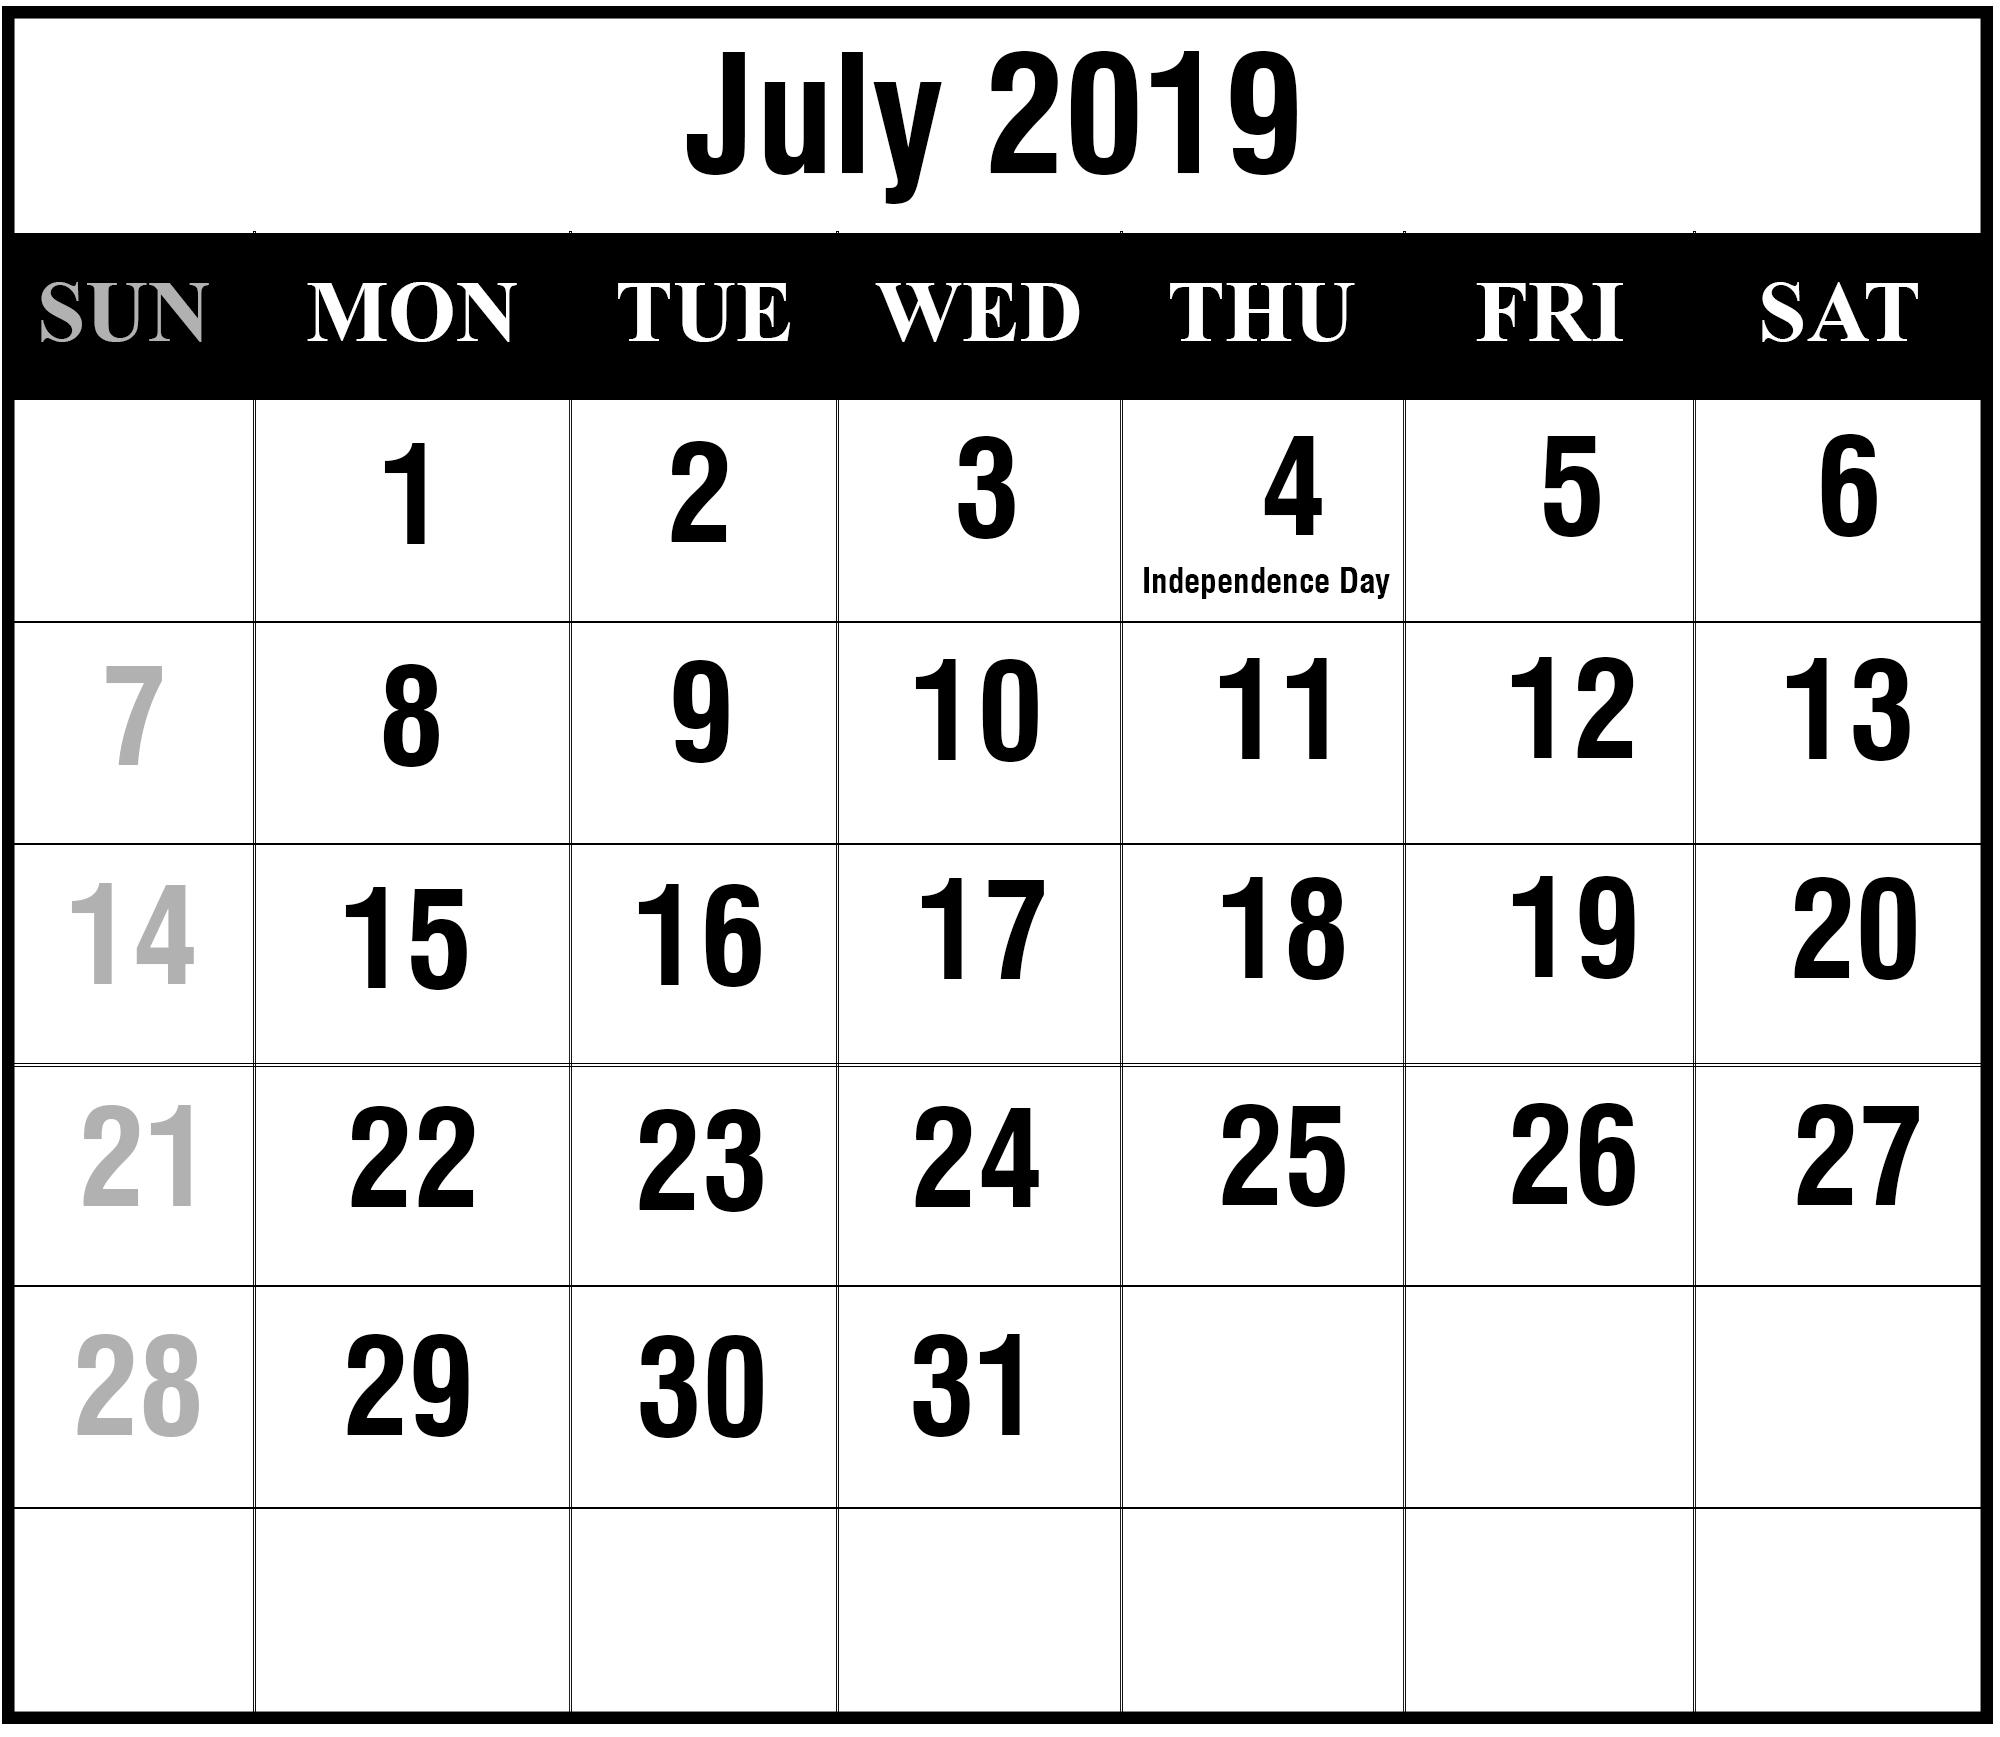 July 2019 Calendar Printable | July Blank Calendar Template pertaining to July Calendar Printable Template